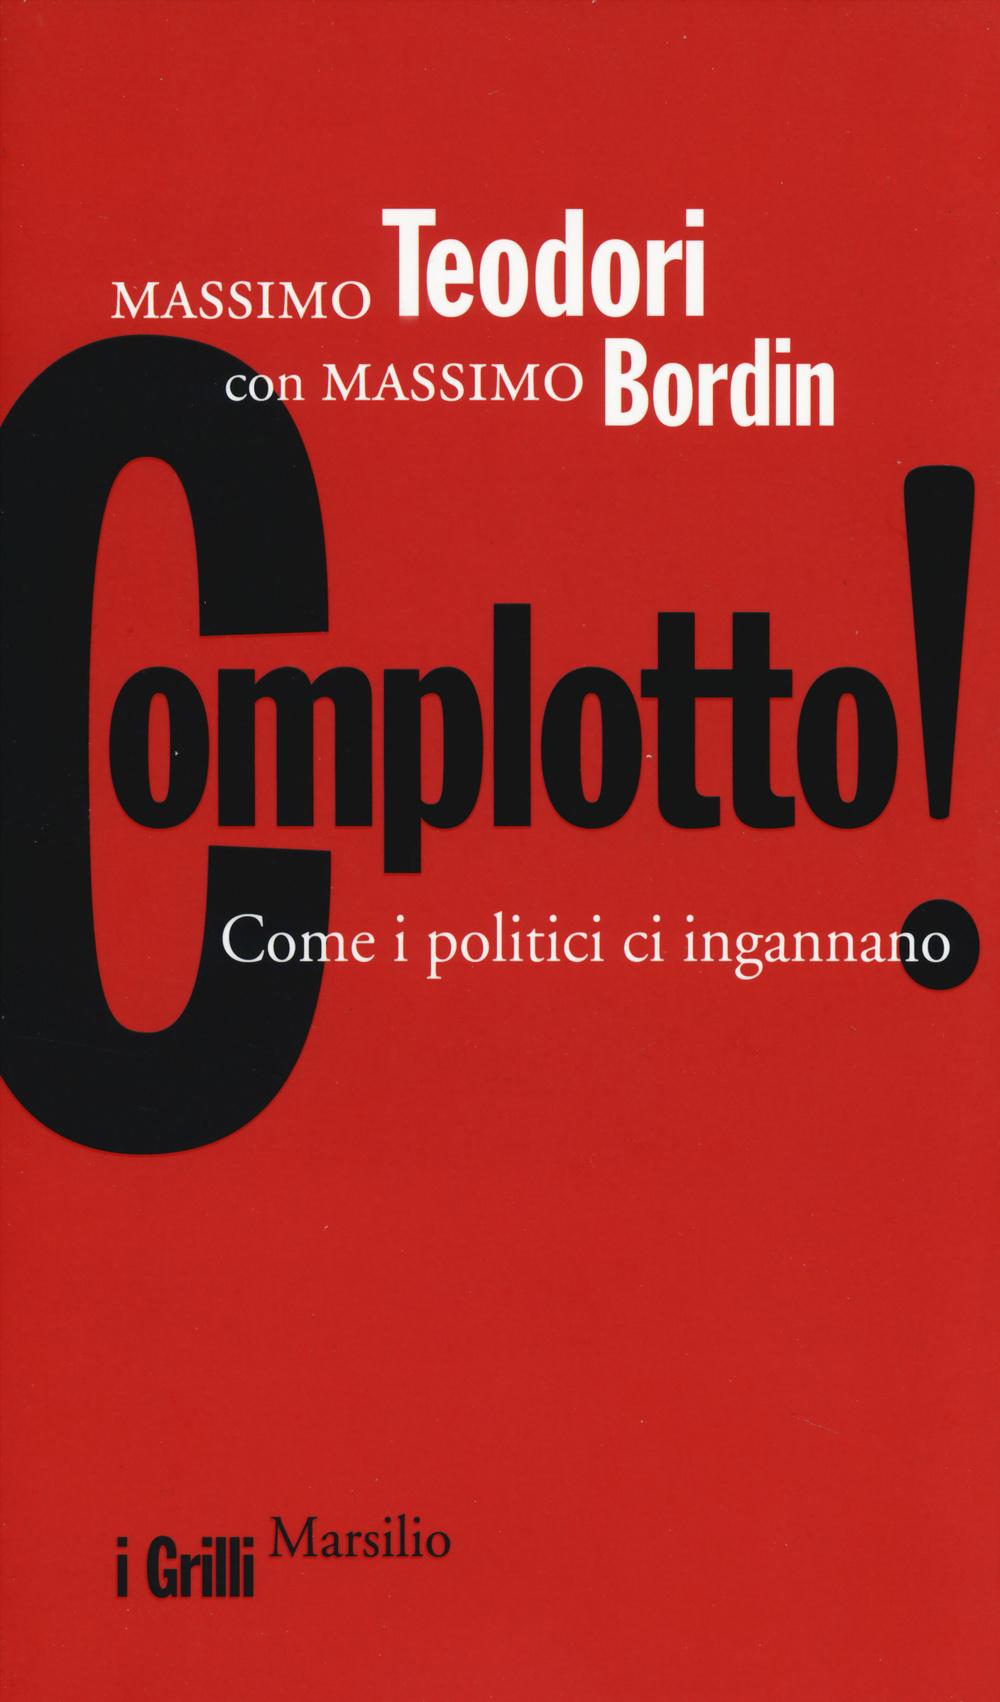 COMPLOTTO! COME I POLITICI CI INGANNANO - 9788831718288